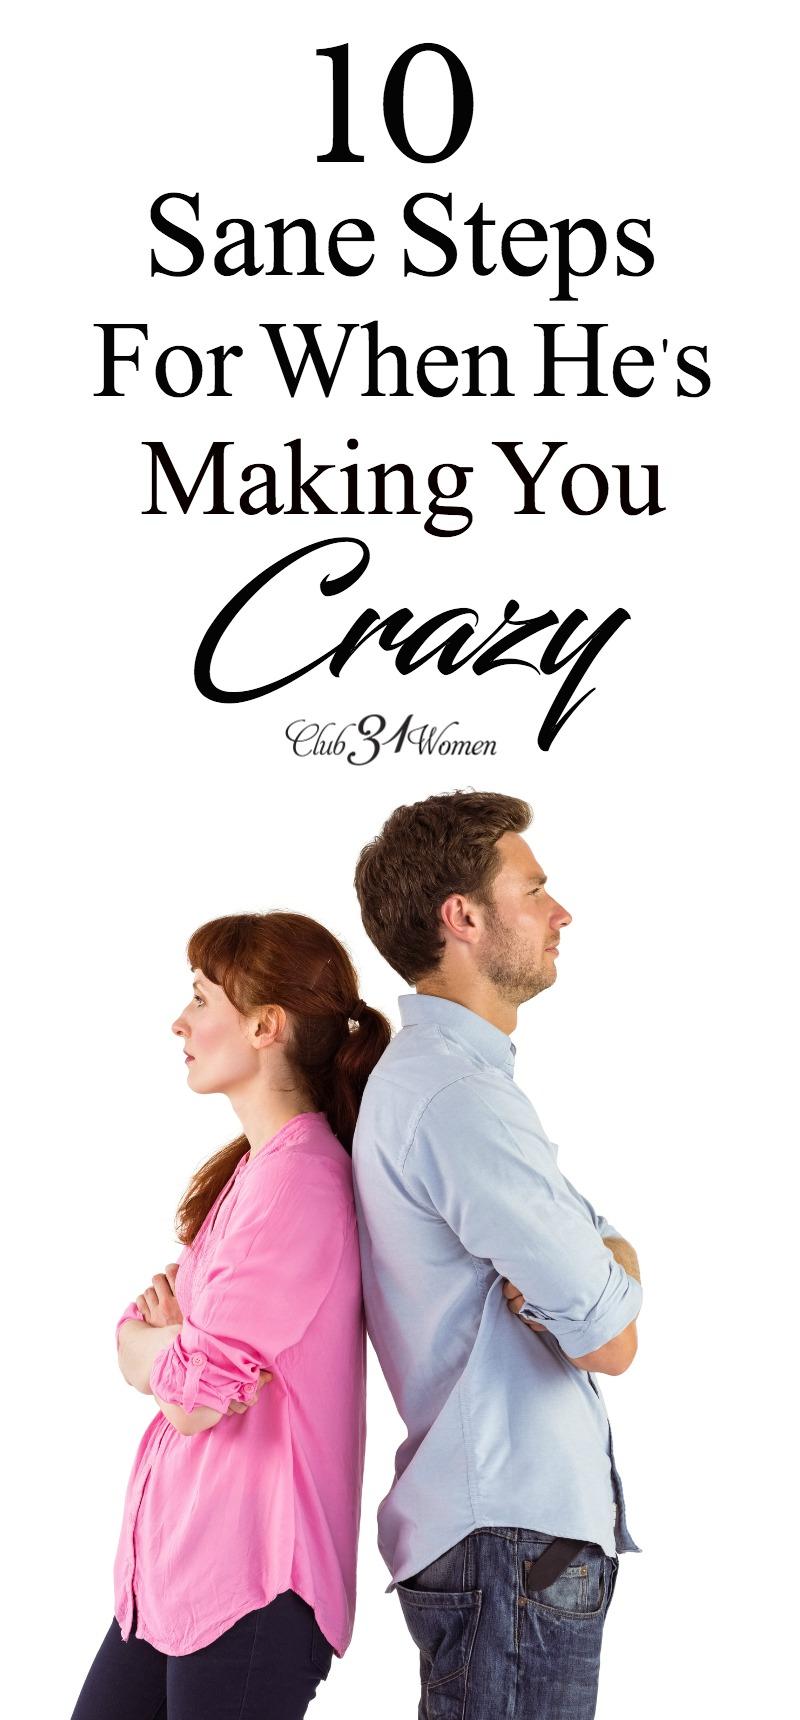 10 Sane Steps for When He Makes You Crazy via @Club31Women